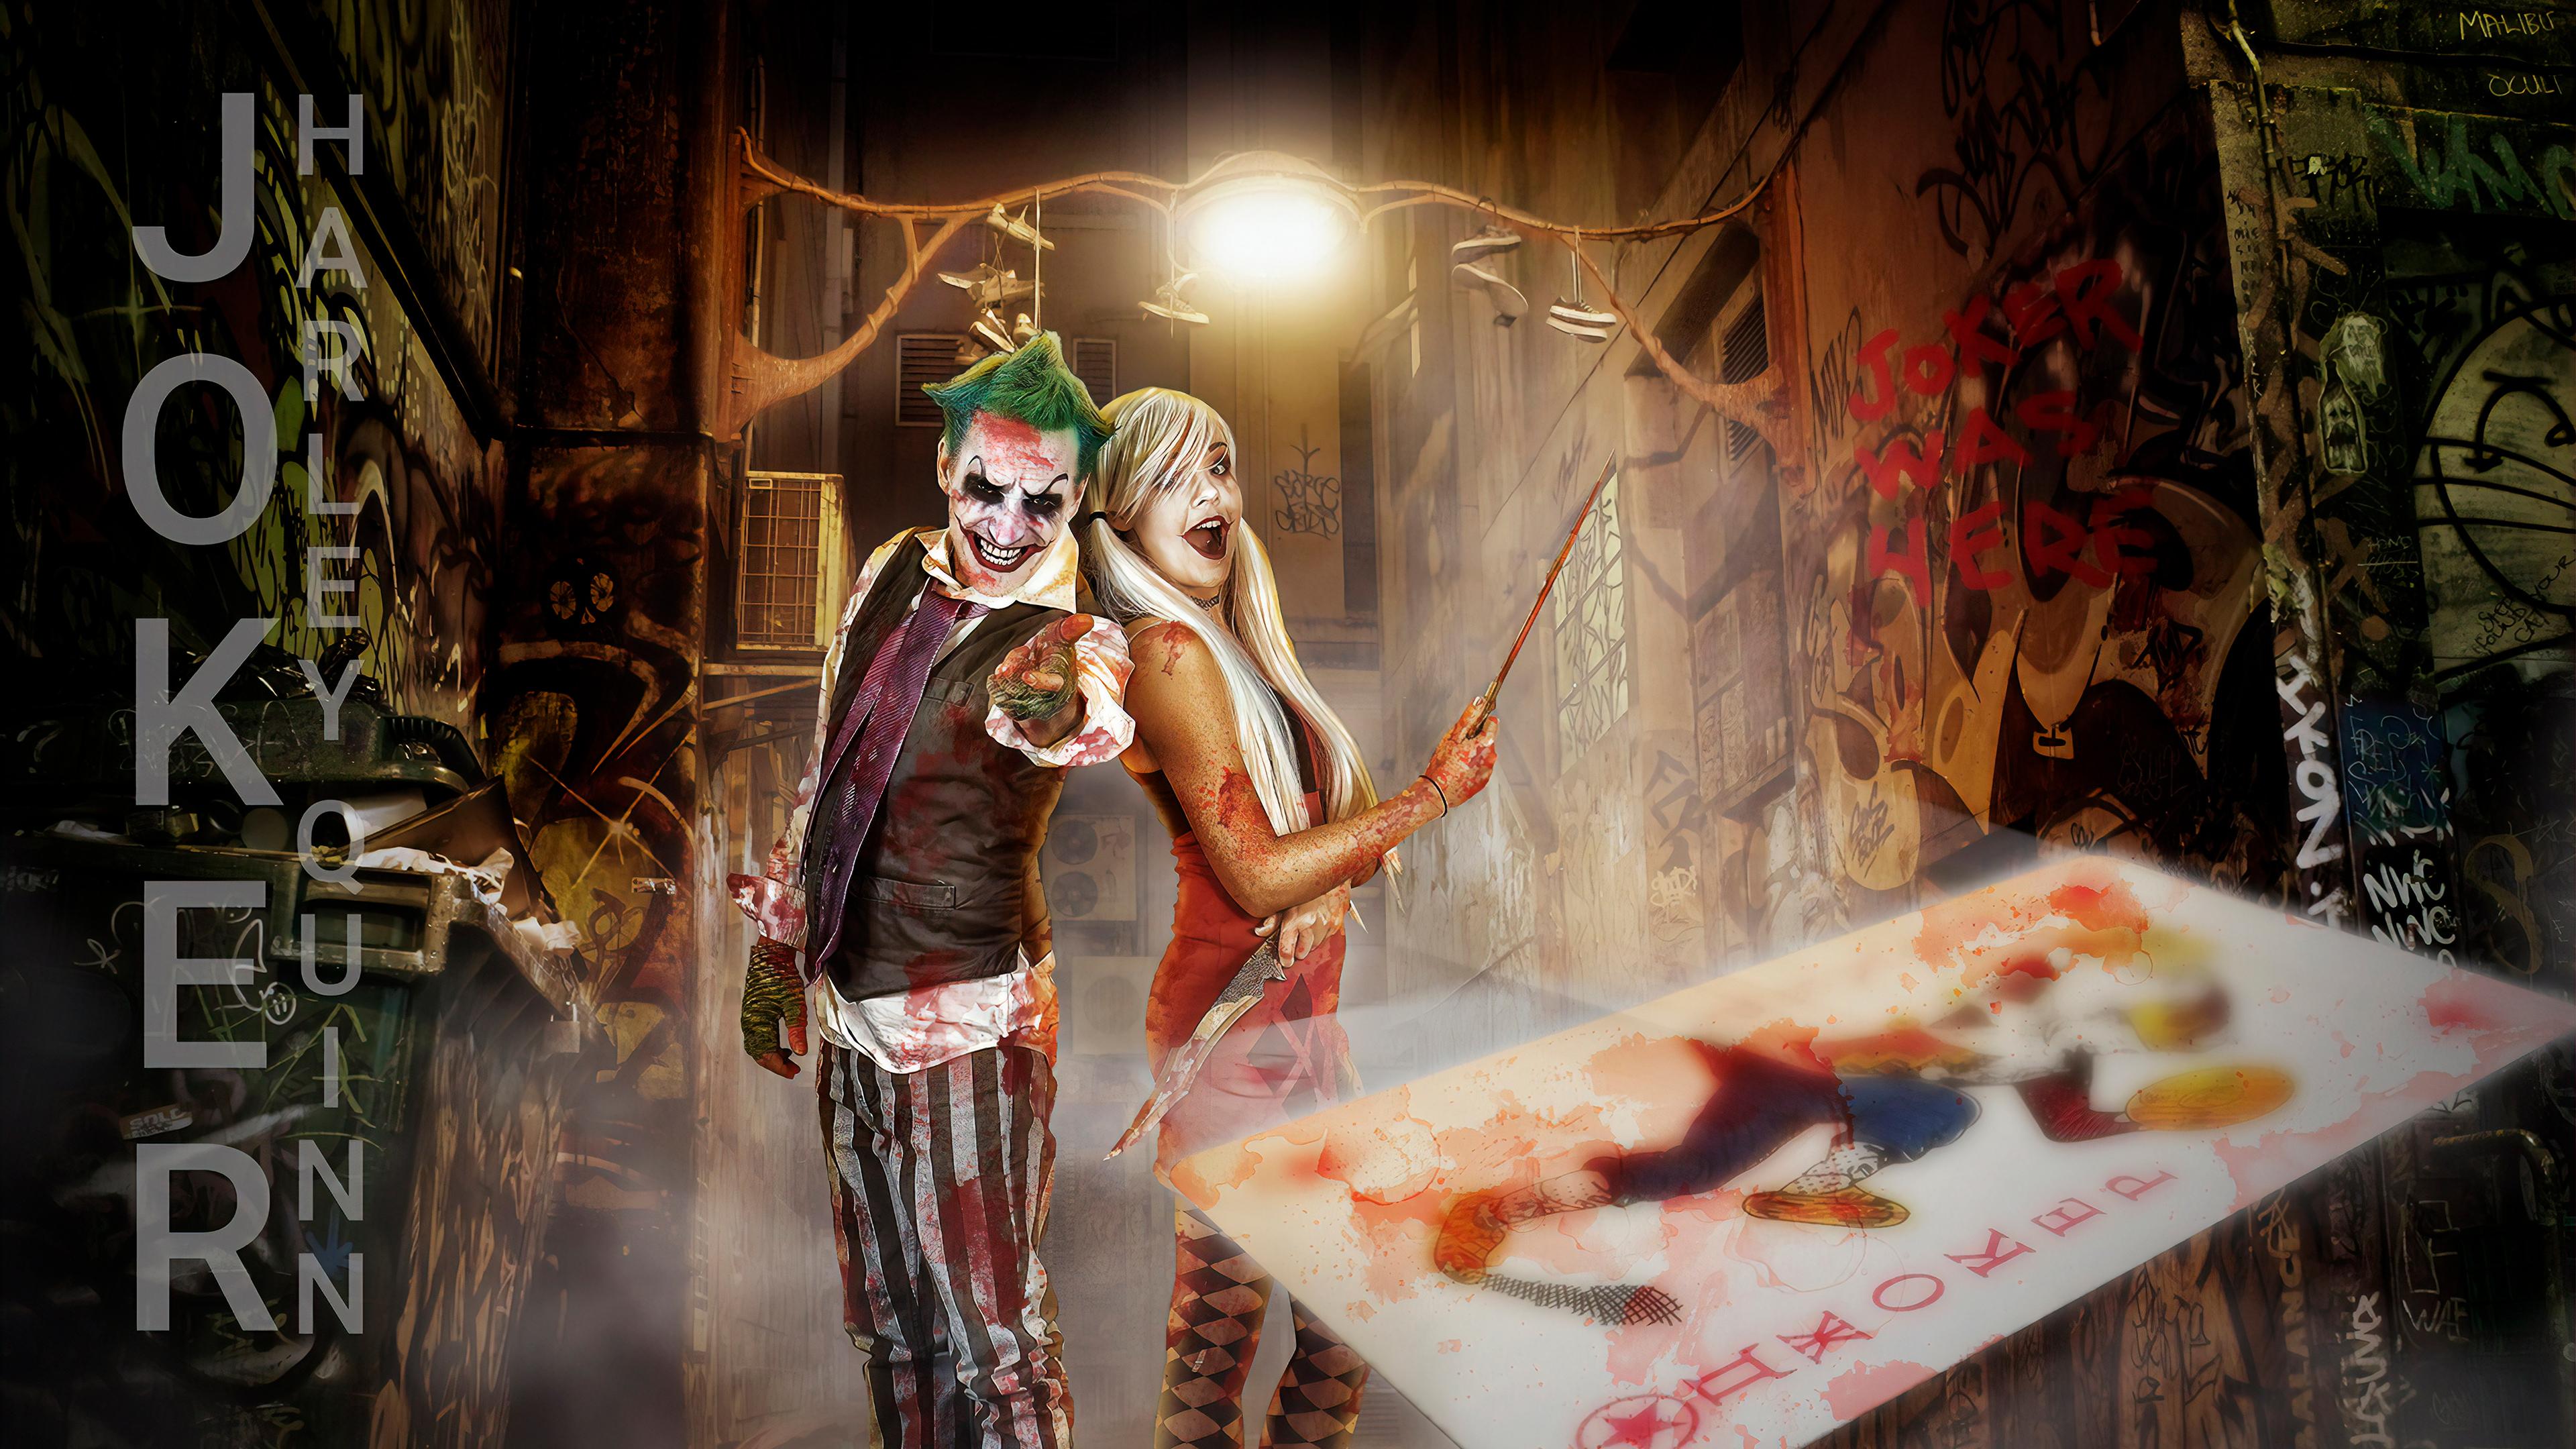 Joker And Harley Quinn Cosplay Photography 4k Hd